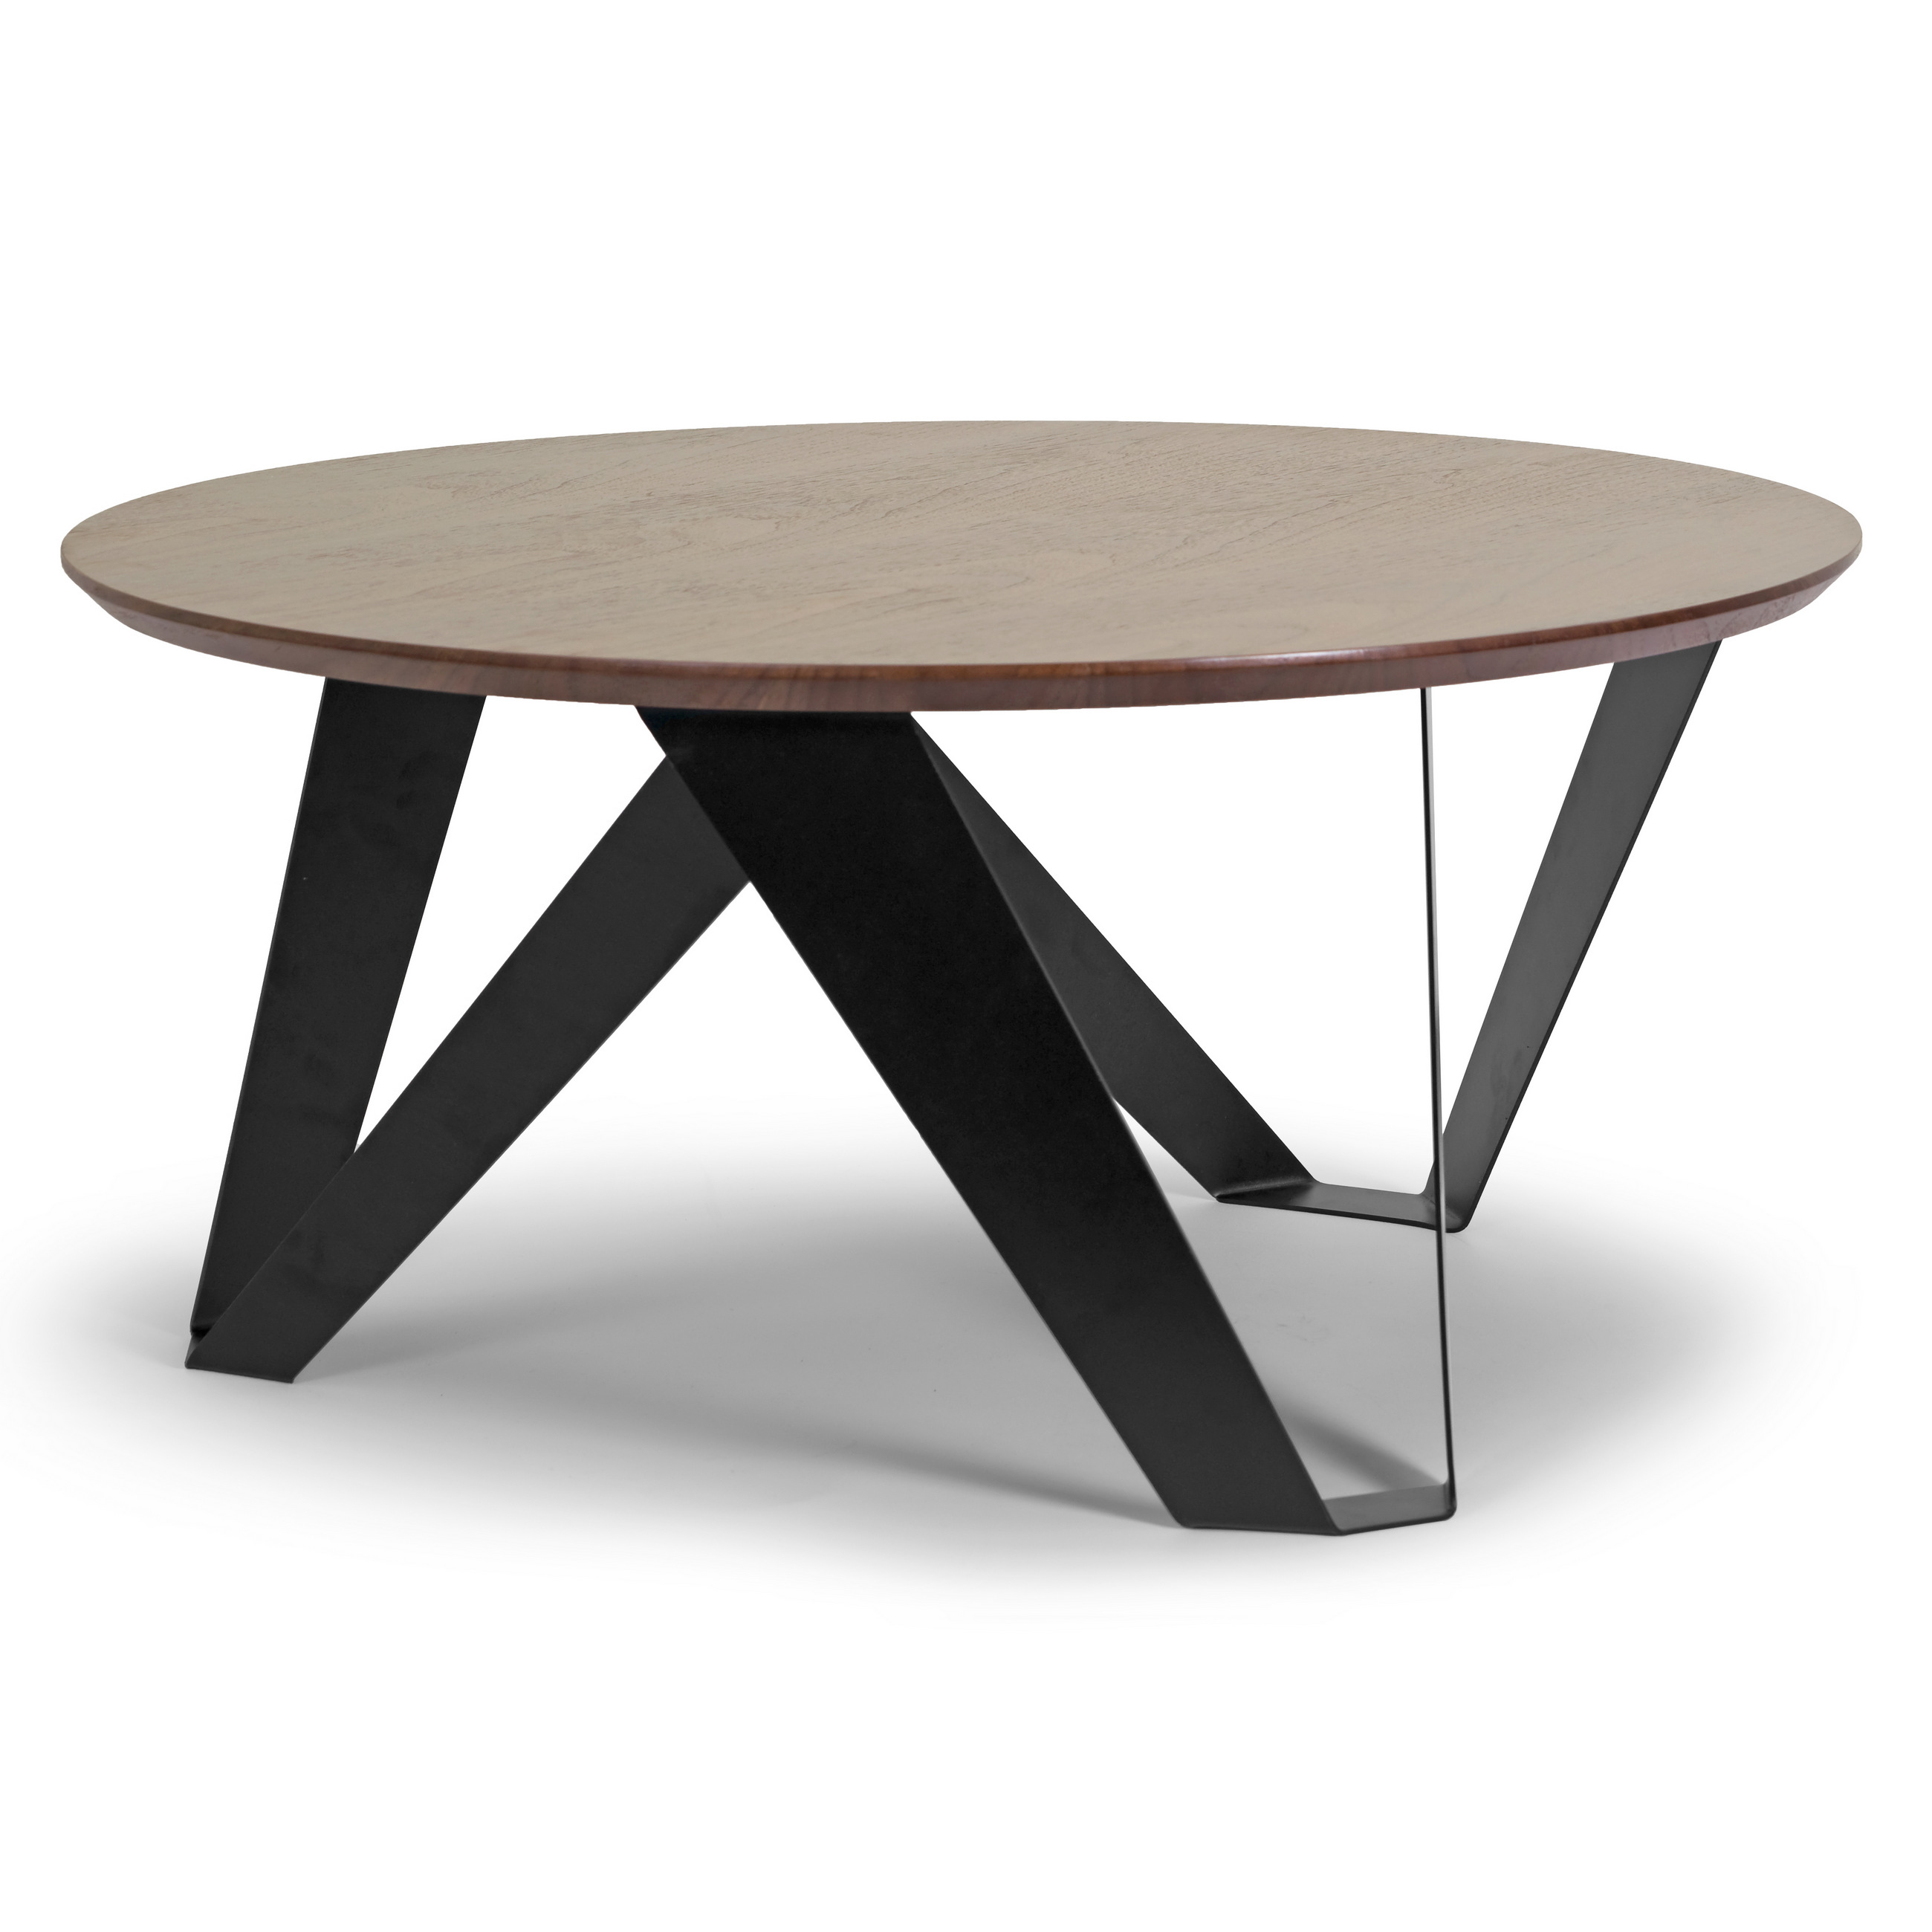 Aimi Walnut Finish Round Modern Coffee Table with Black Metal Legs